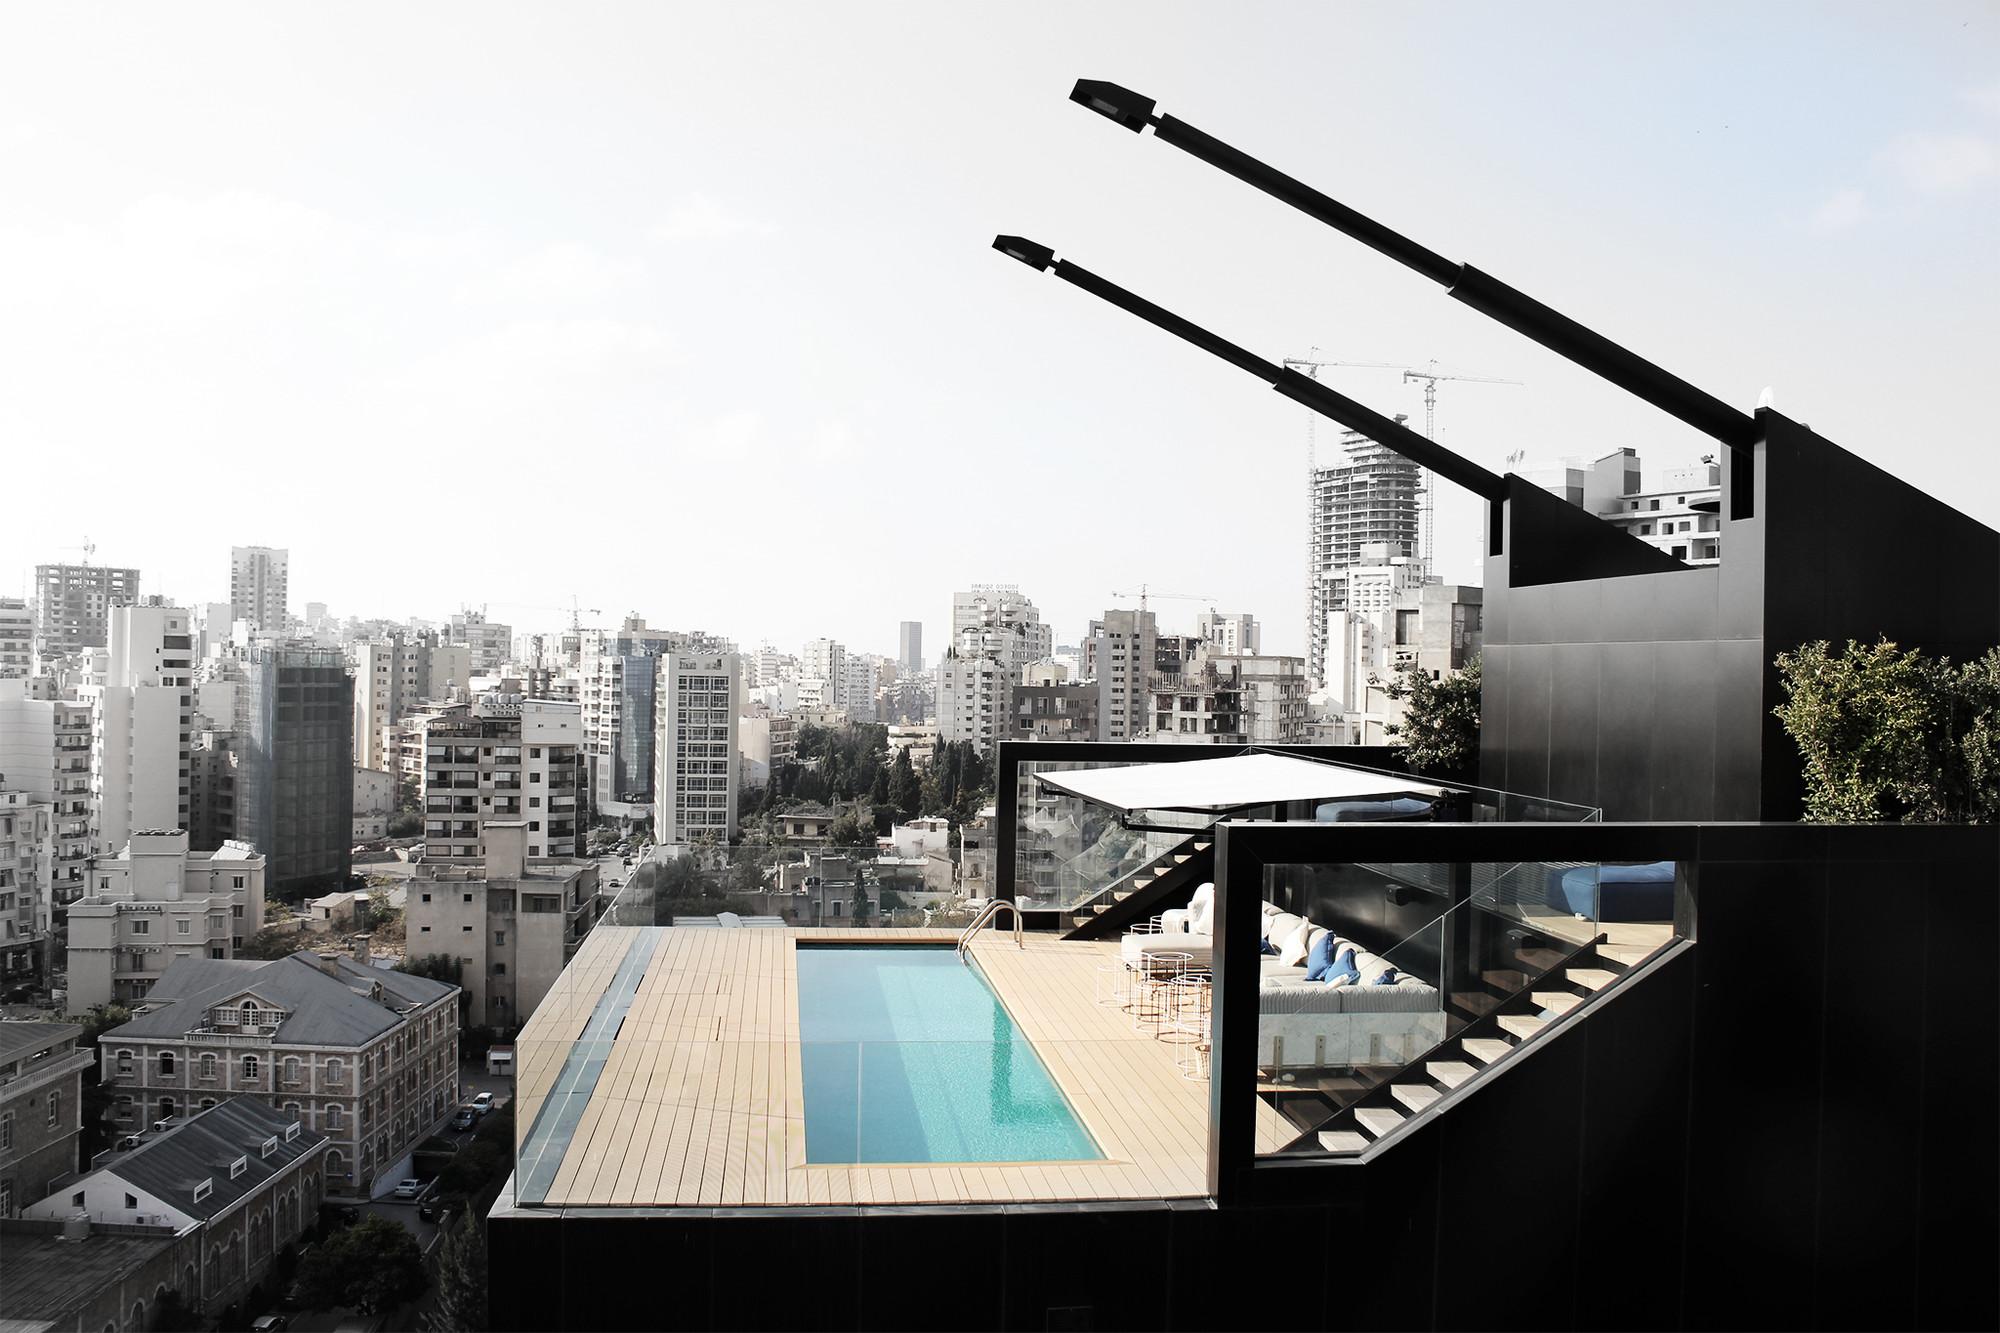 N.B.K. Residence (2) / DW5 / Bernard Khoury, Courtesy of DW5 / Bernard Khoury